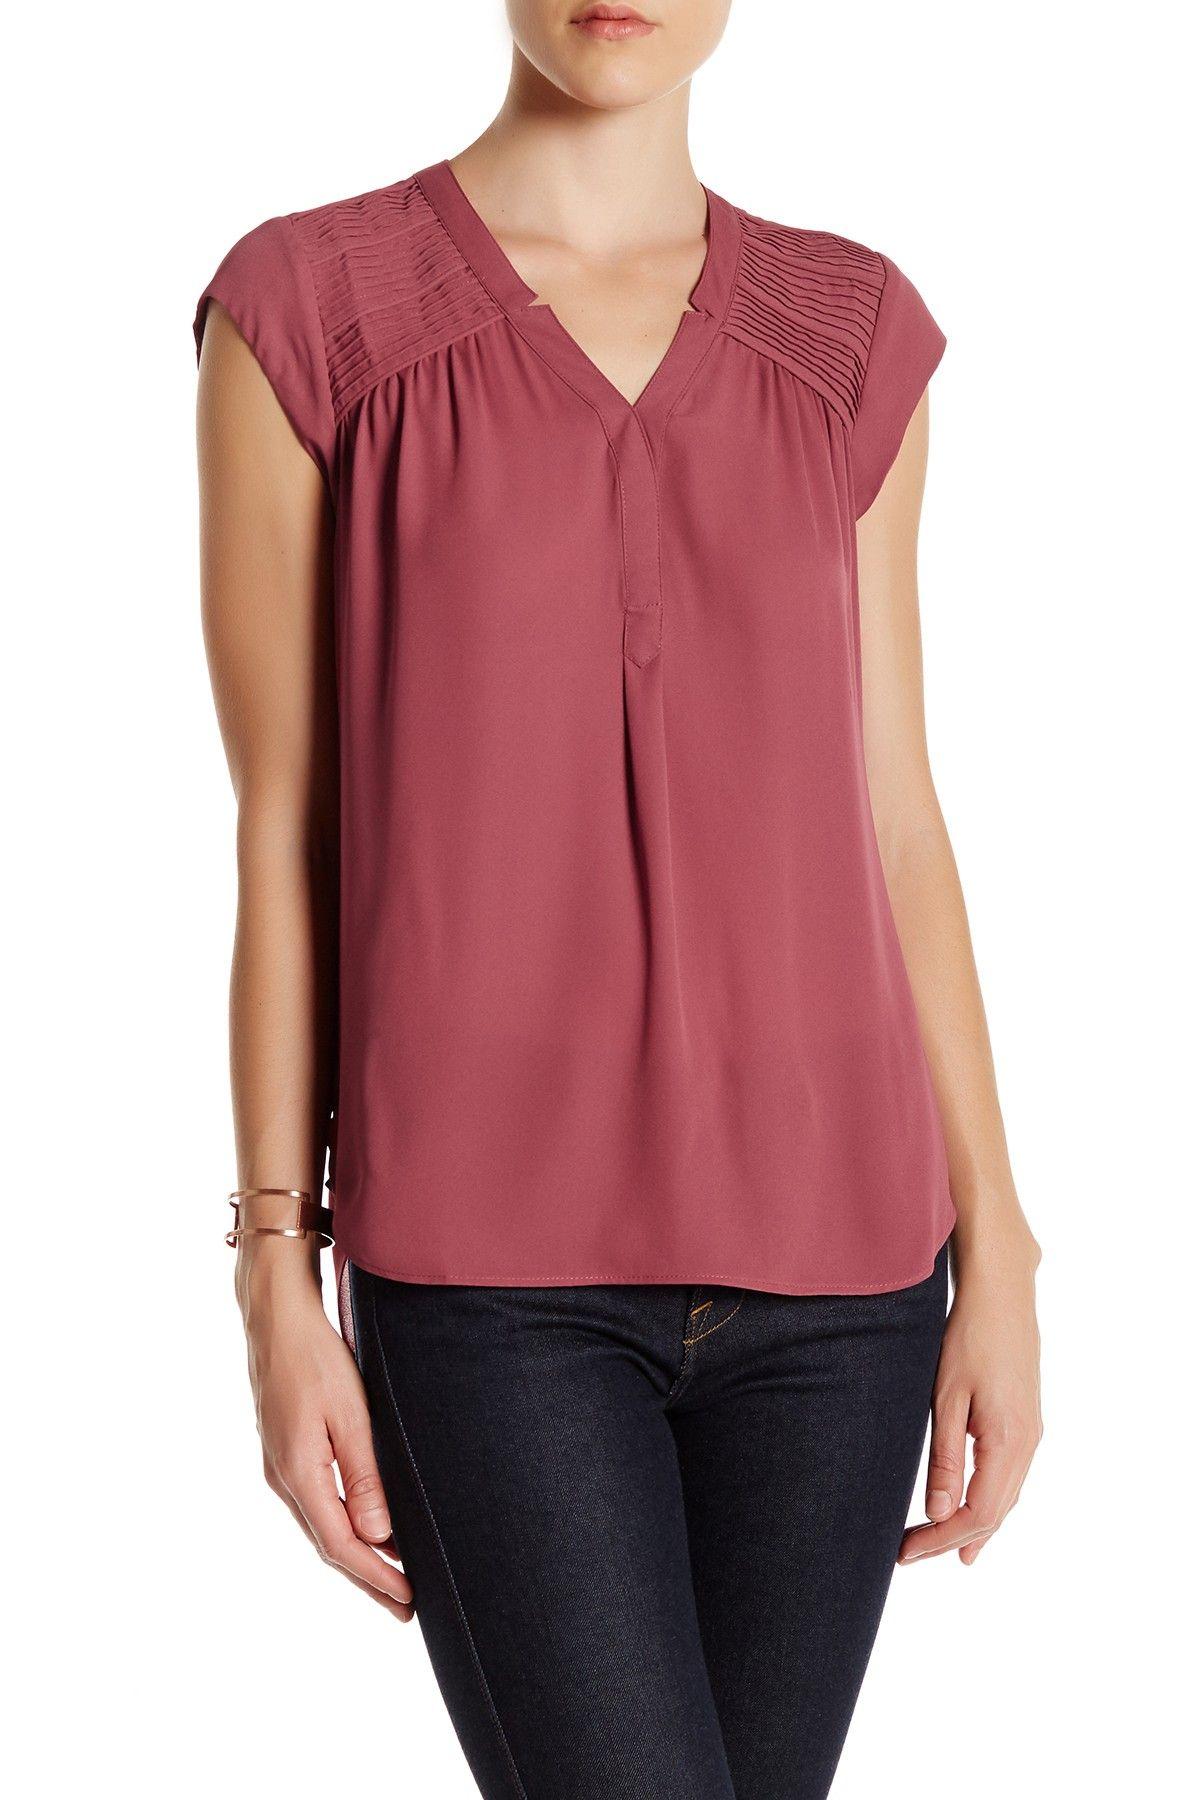 Dr2 by daniel rainn pleated shoulder blouse nordstrom